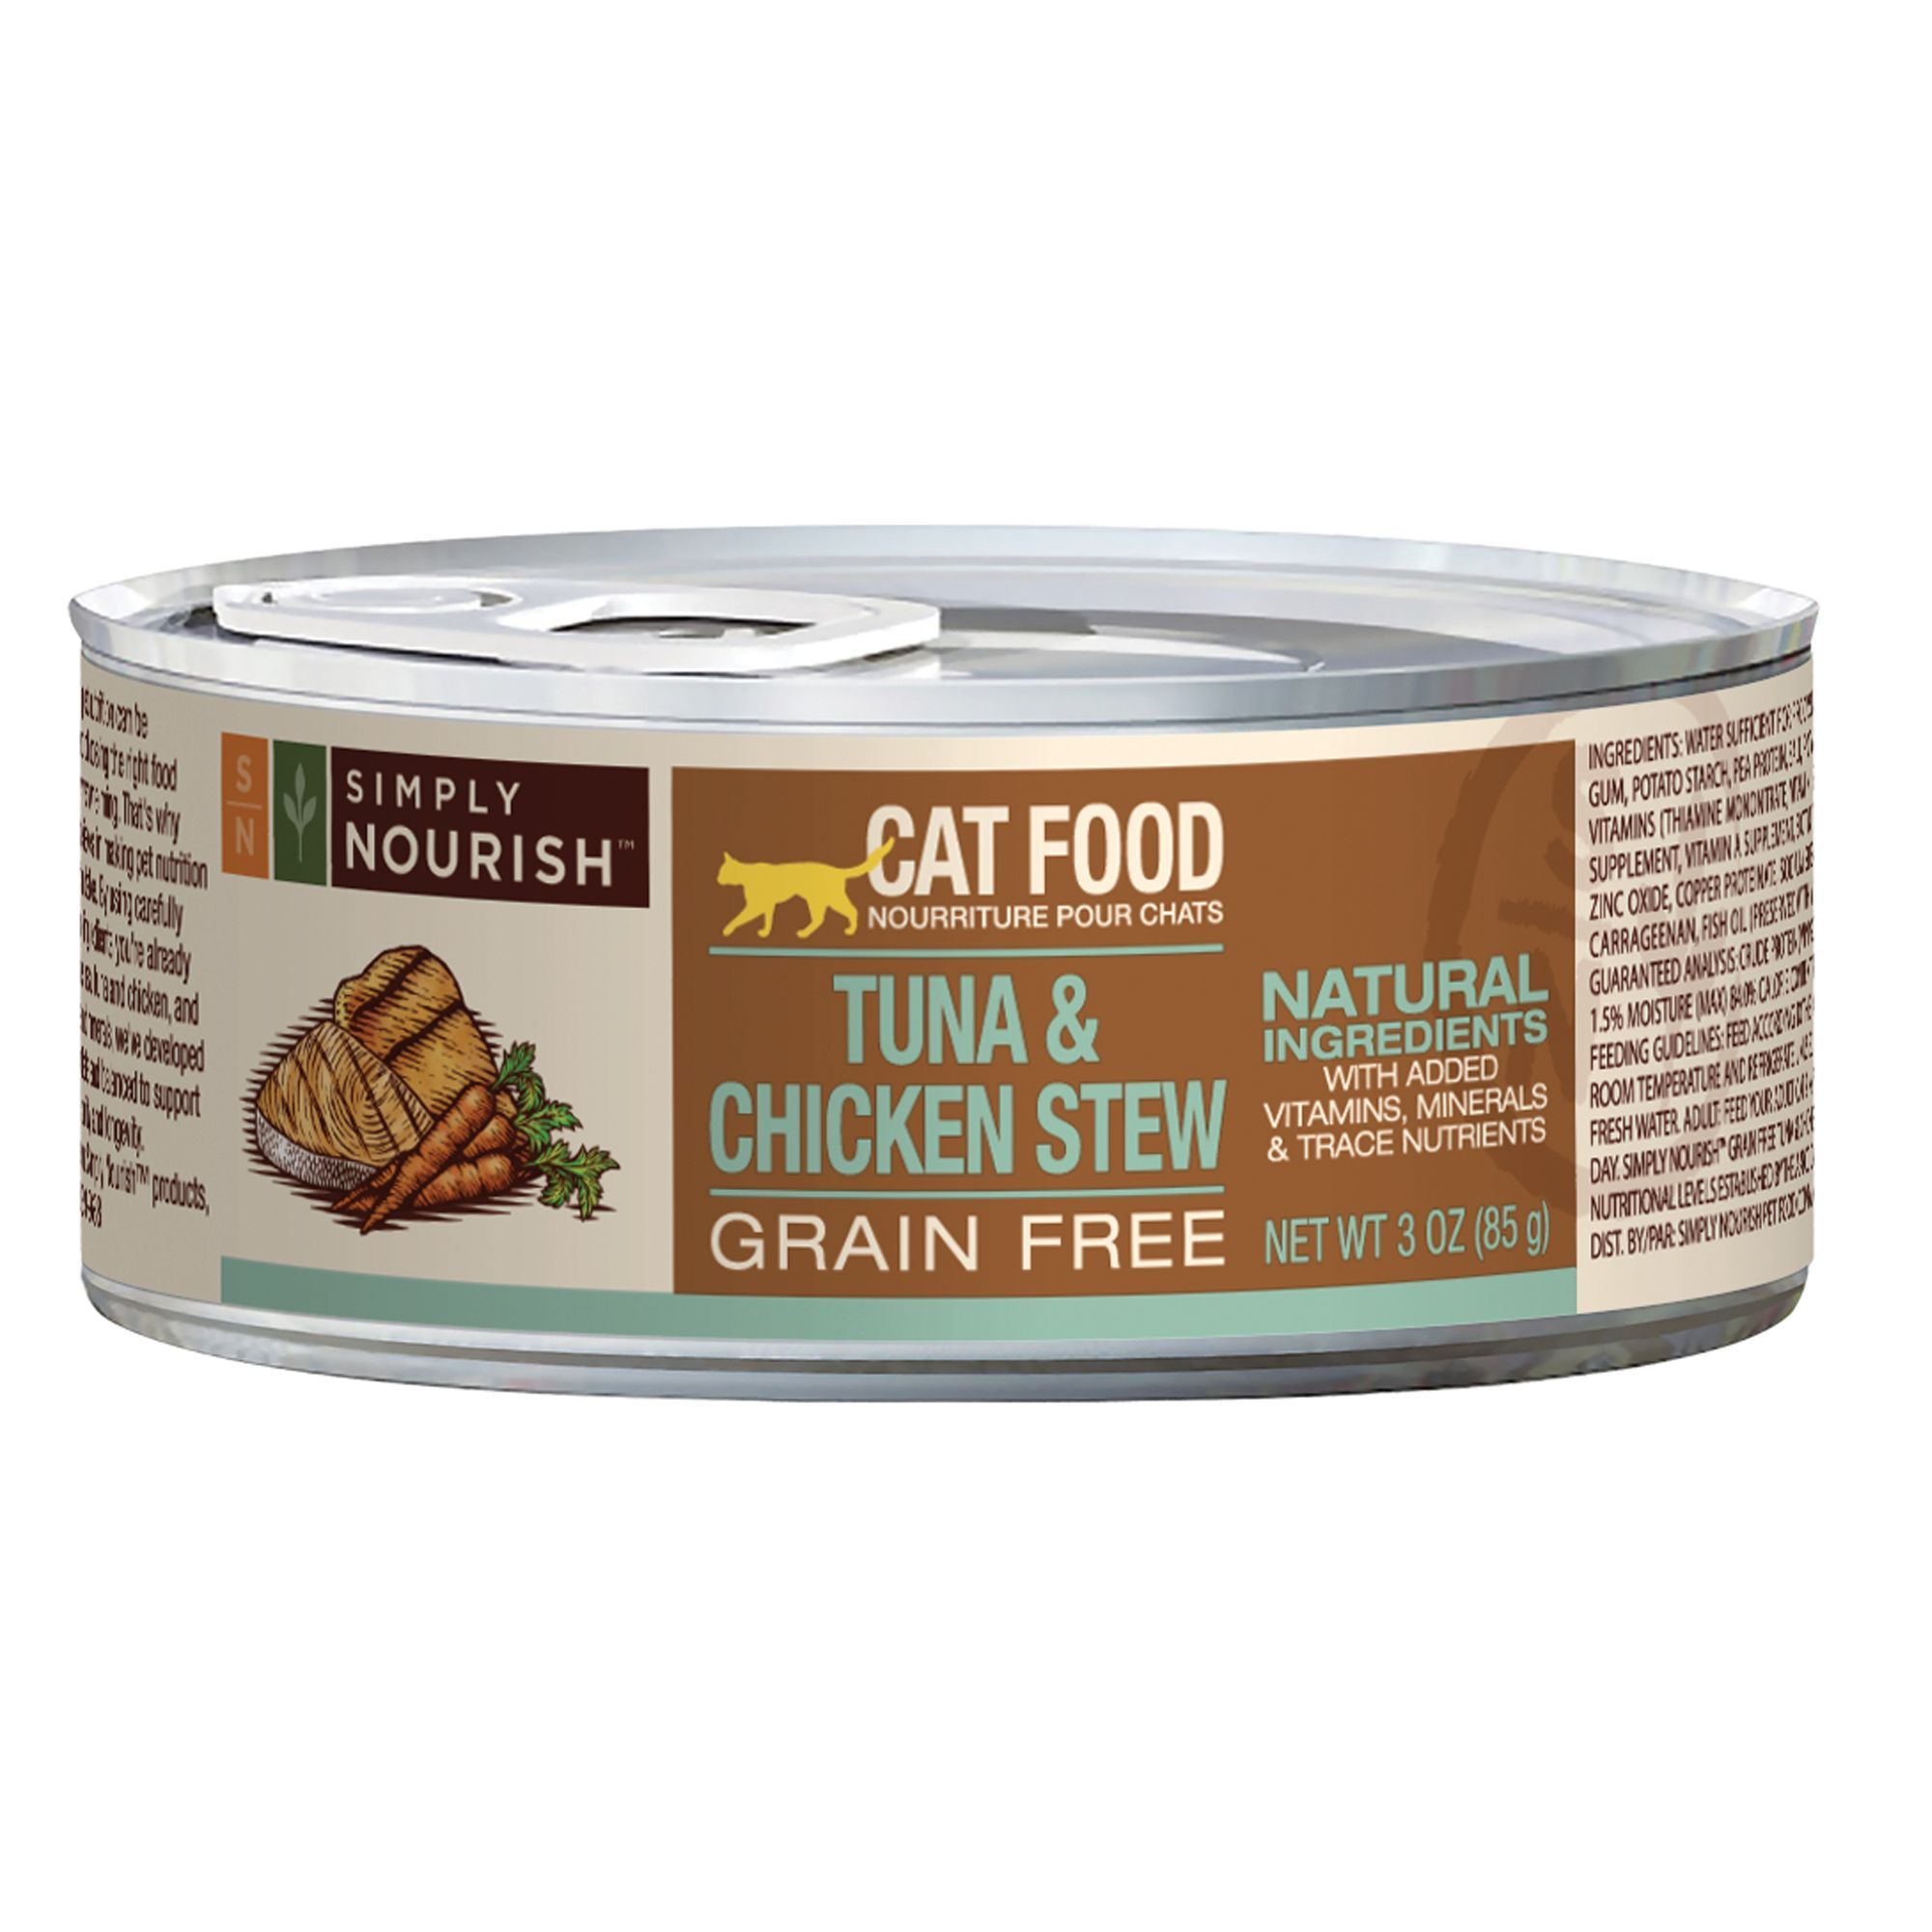 Simply Nourish Cat Food Natural Grain Free Tuna Chicken